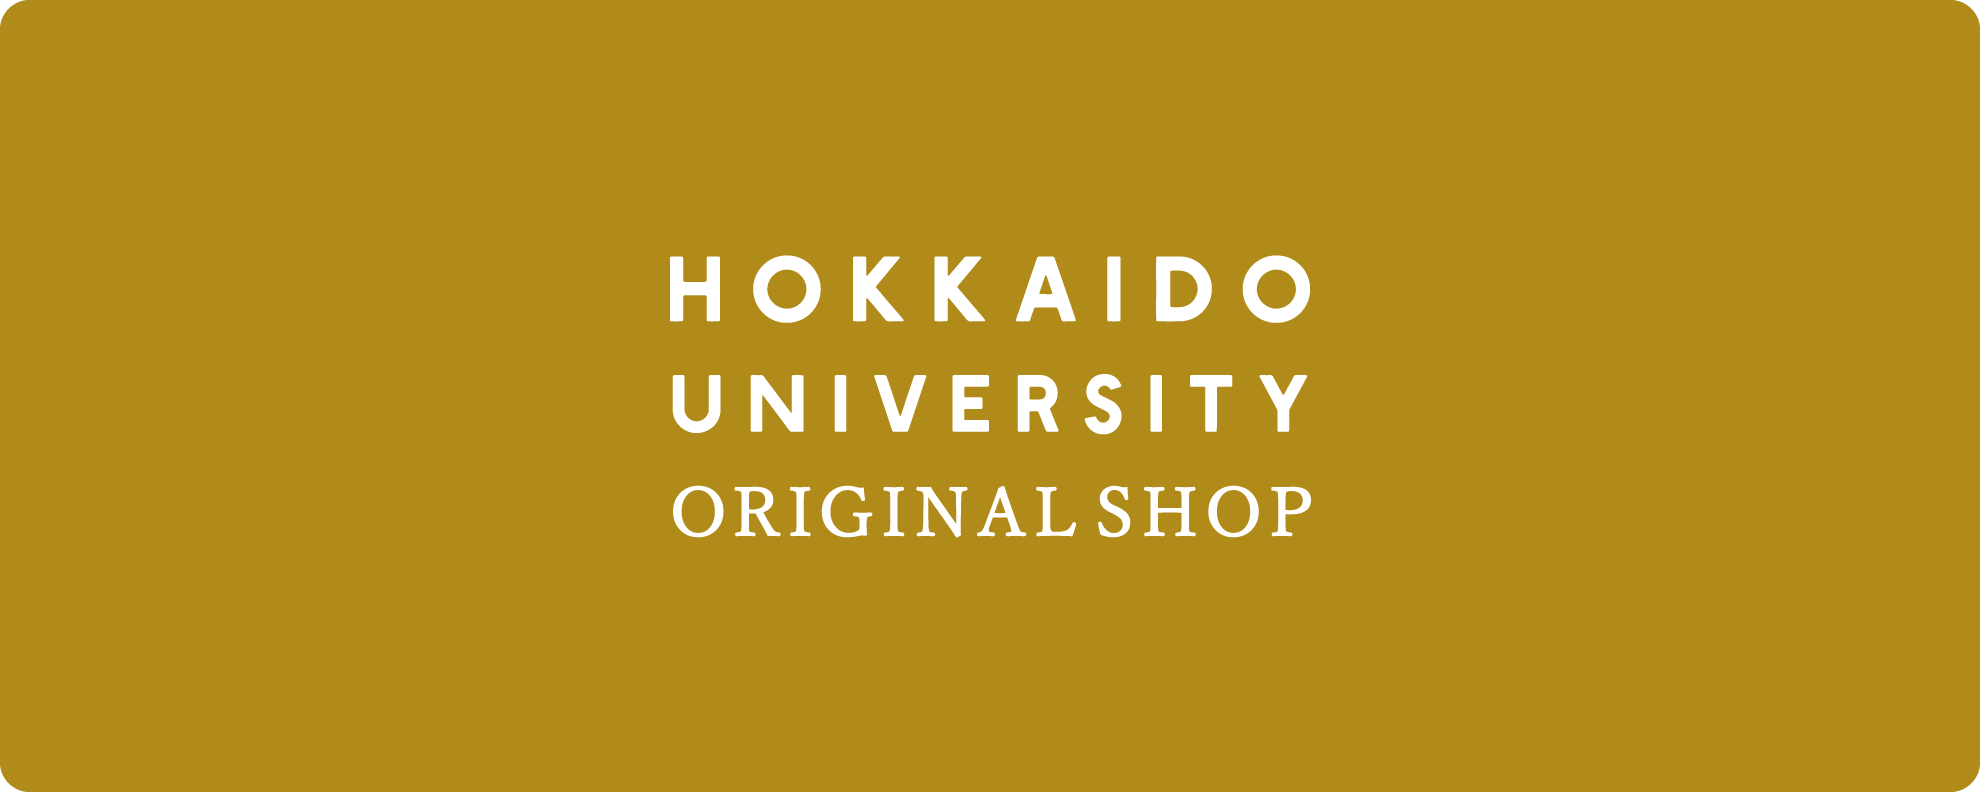 北海道大学 Original Shop Online